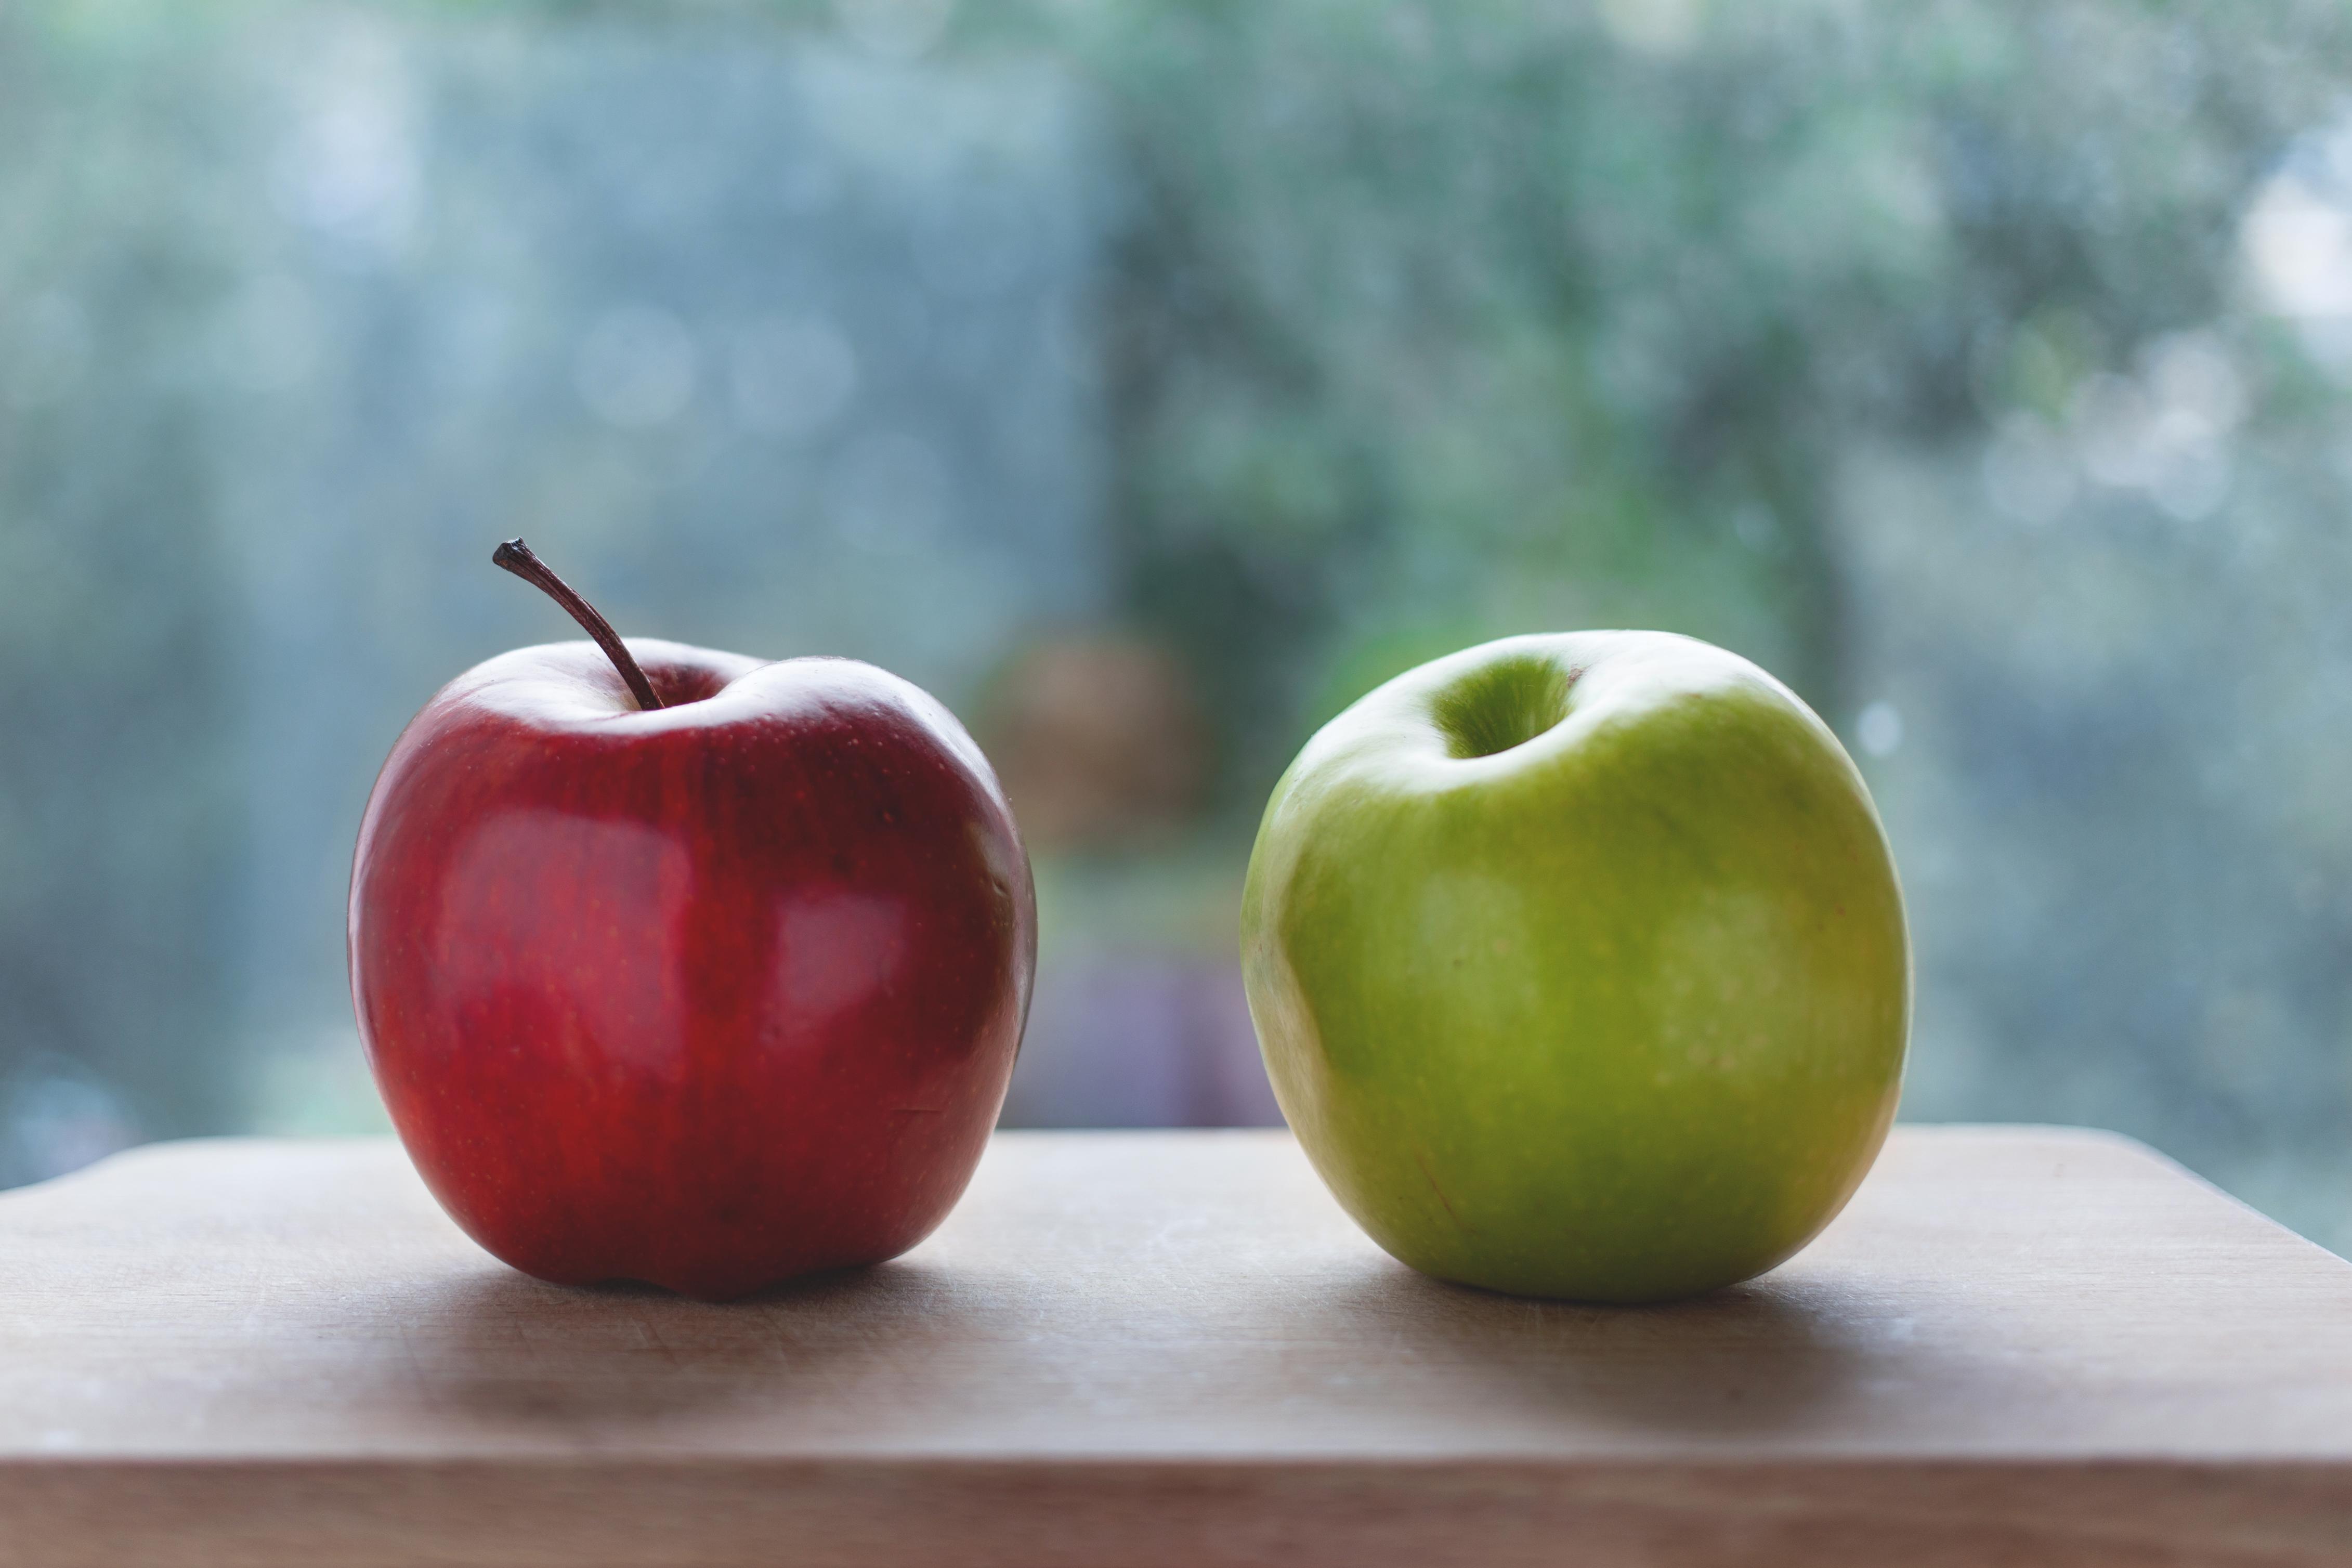 Fotos gratis : manzana, mesa, Fruta, dulce, comida, rojo, Produce ...